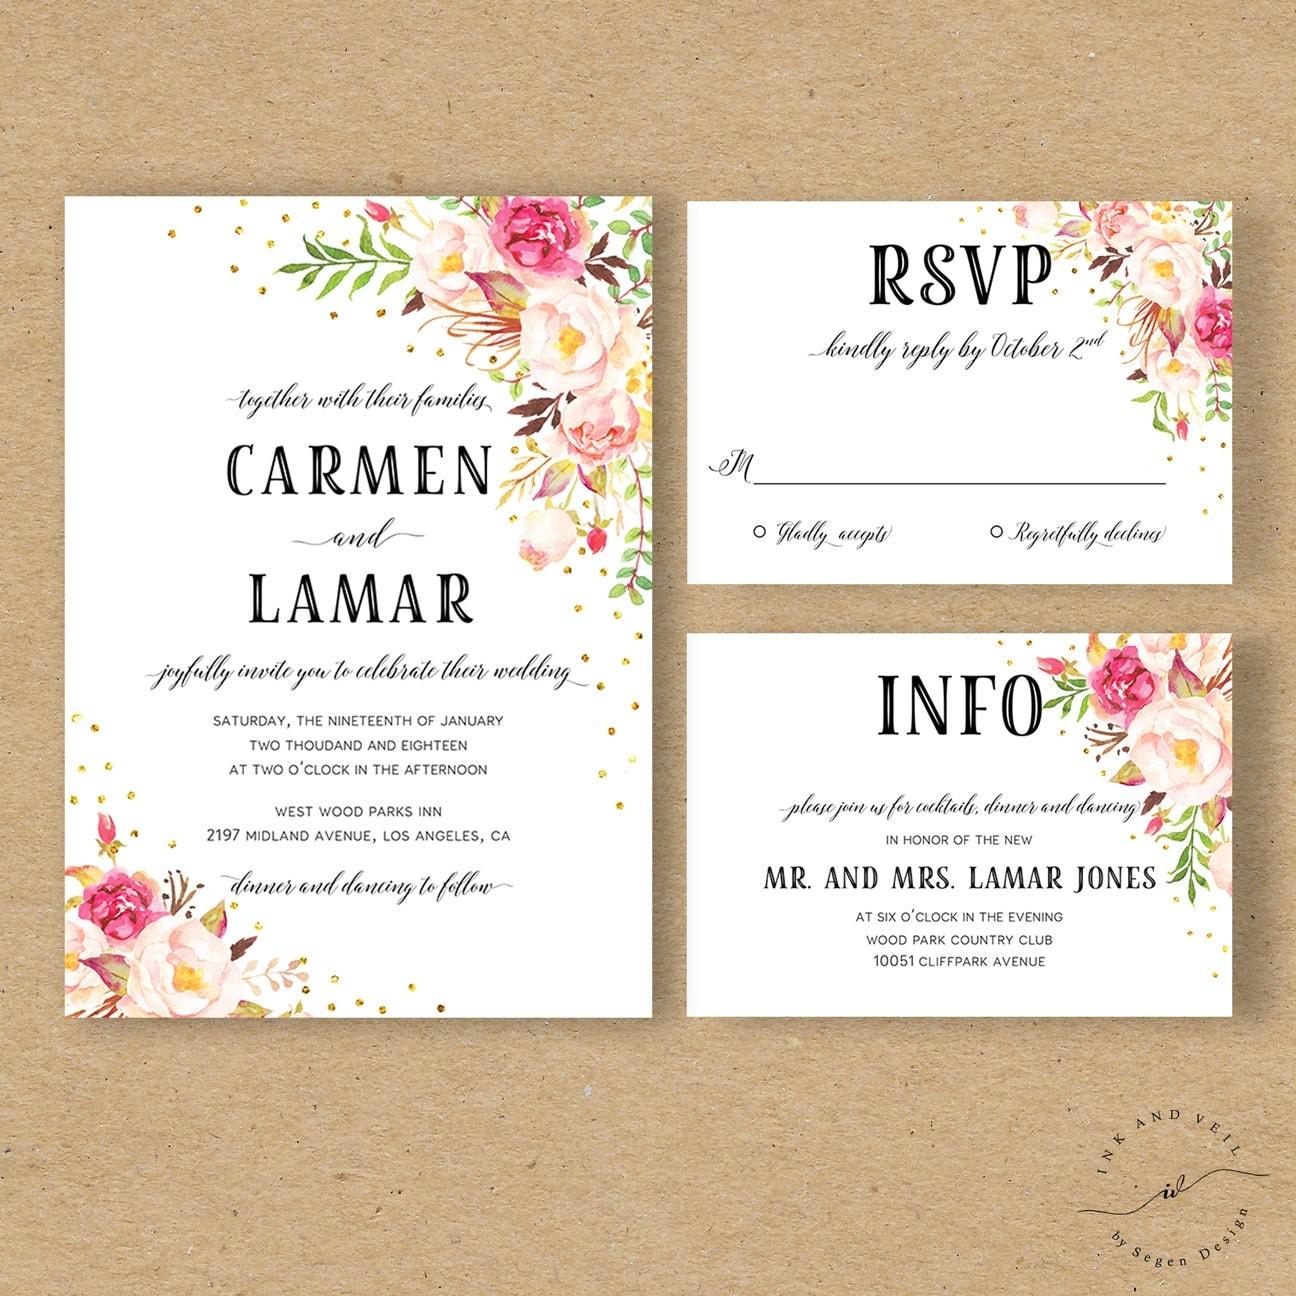 Bohemian Wedding Invitations: Bohemian Floral Wedding Invitation Boho Wedding Invite